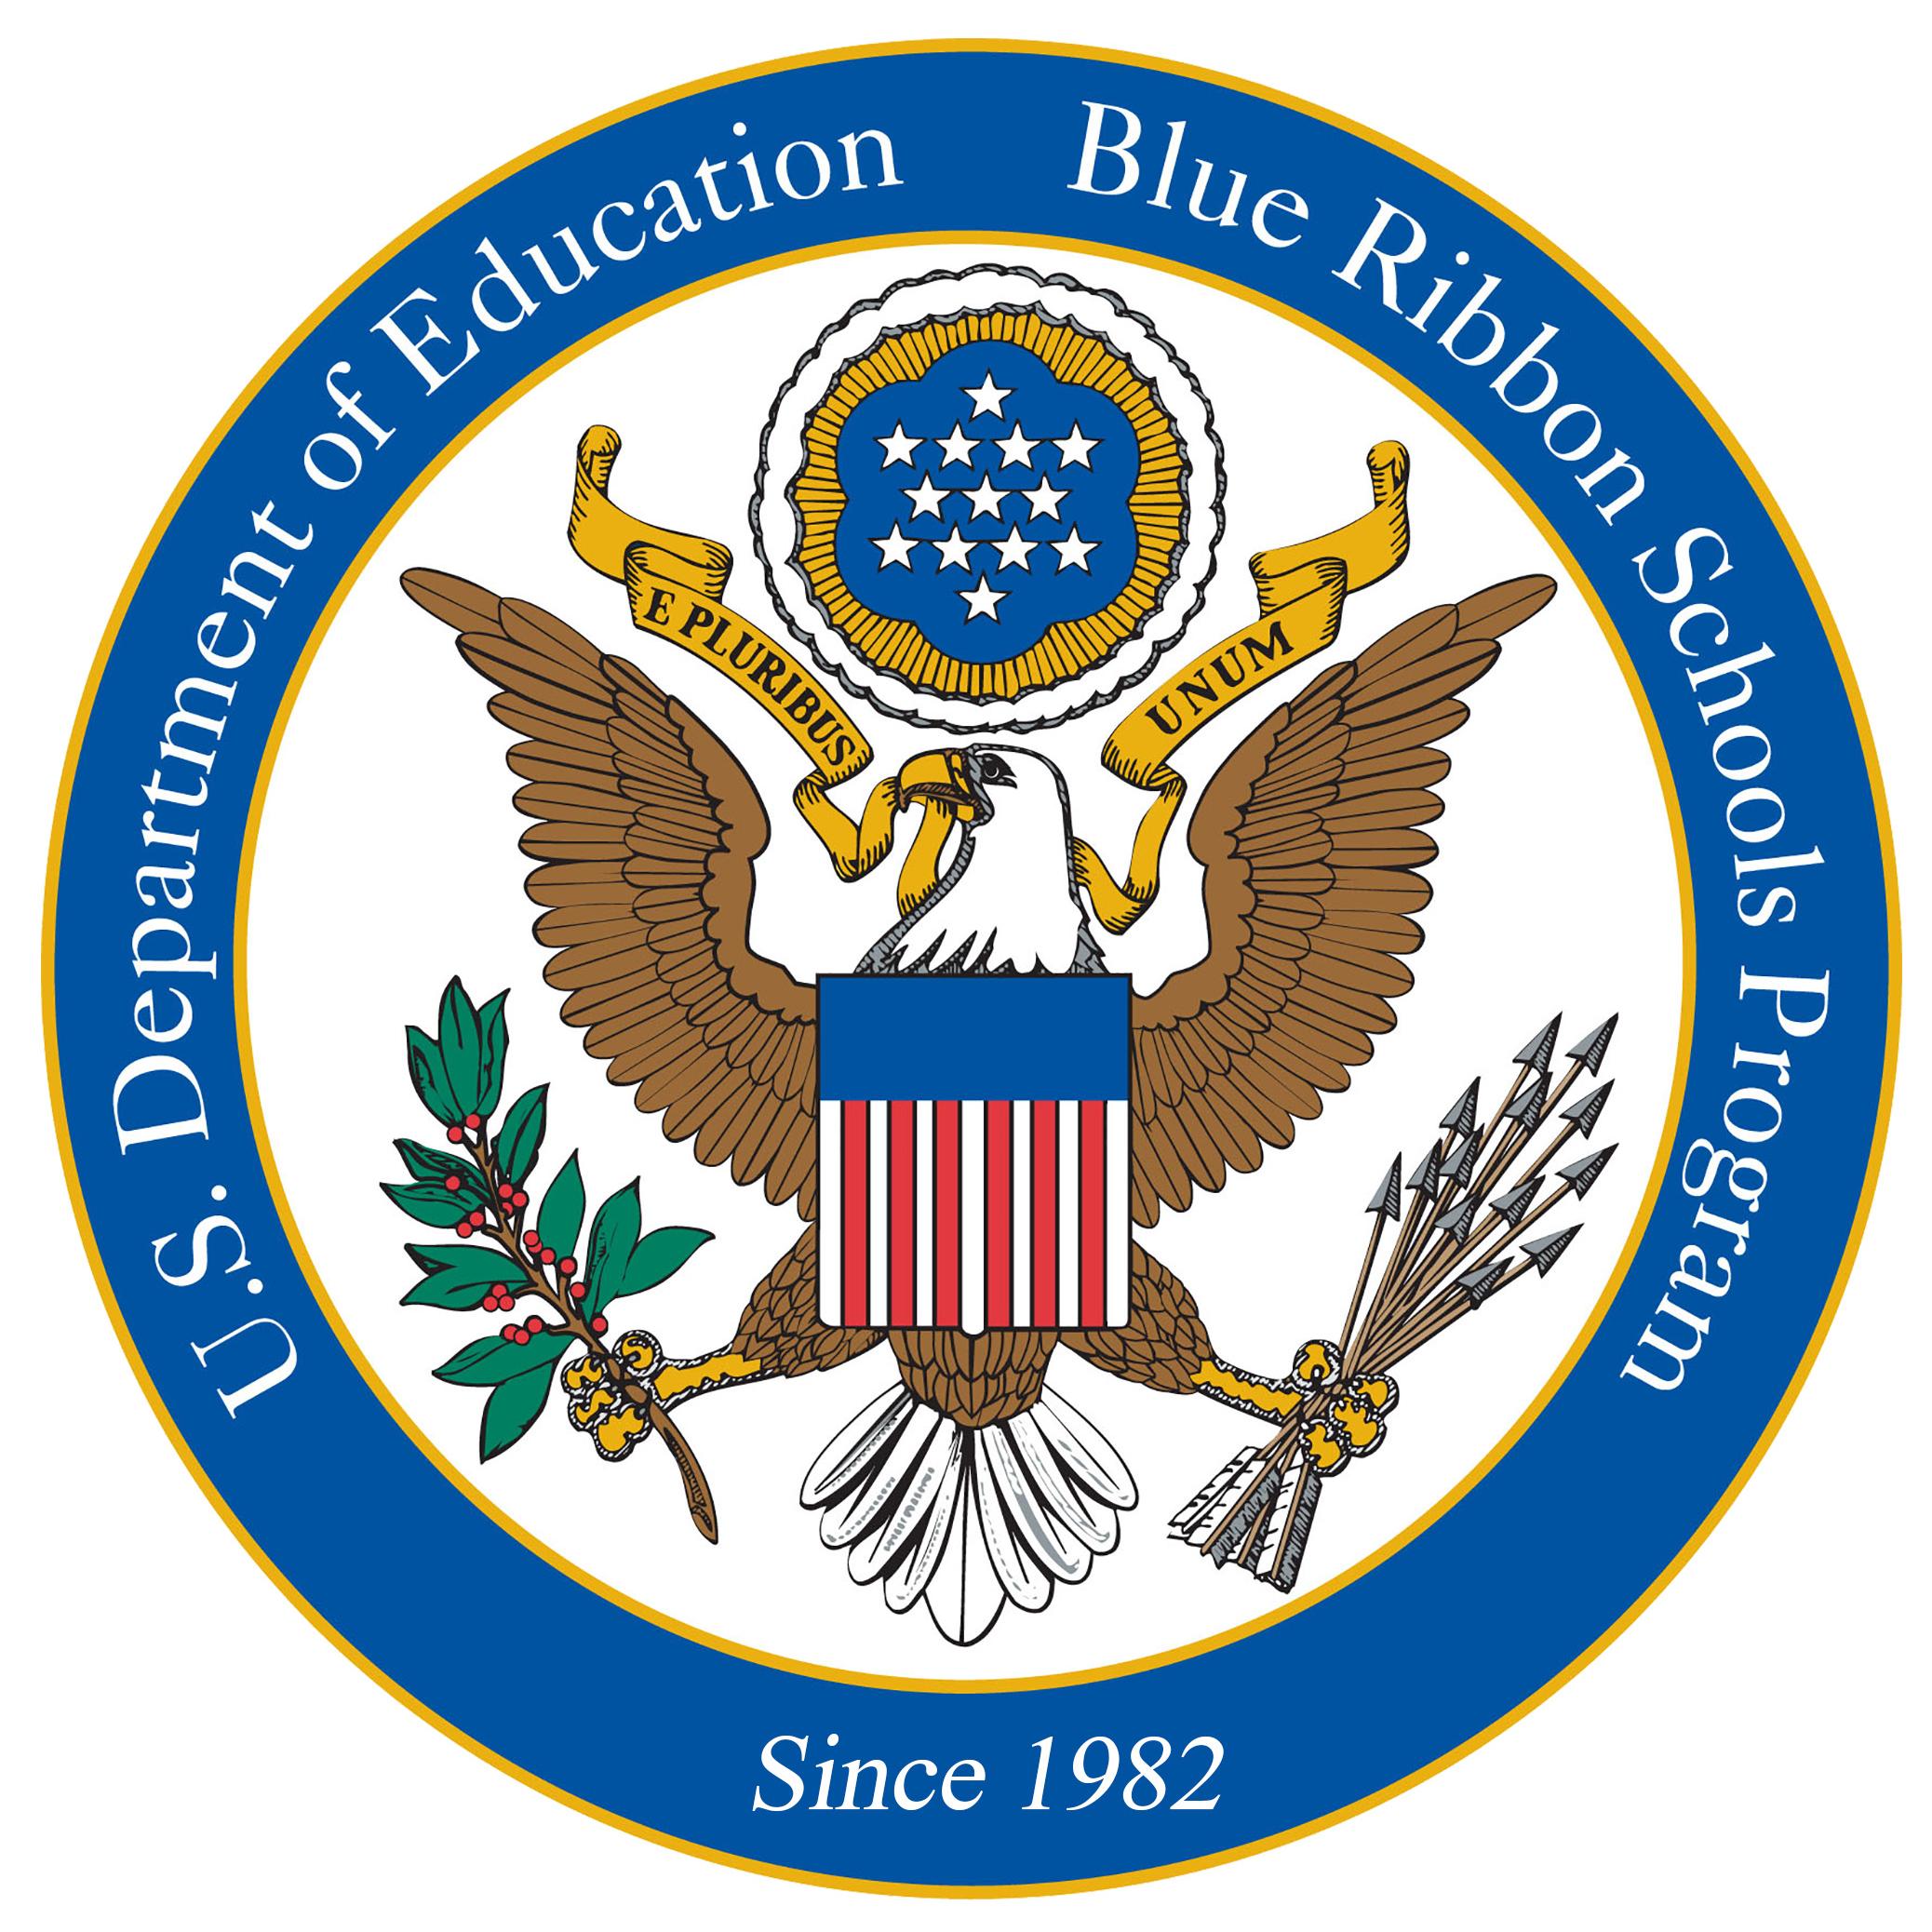 Blue Ribbon Seal